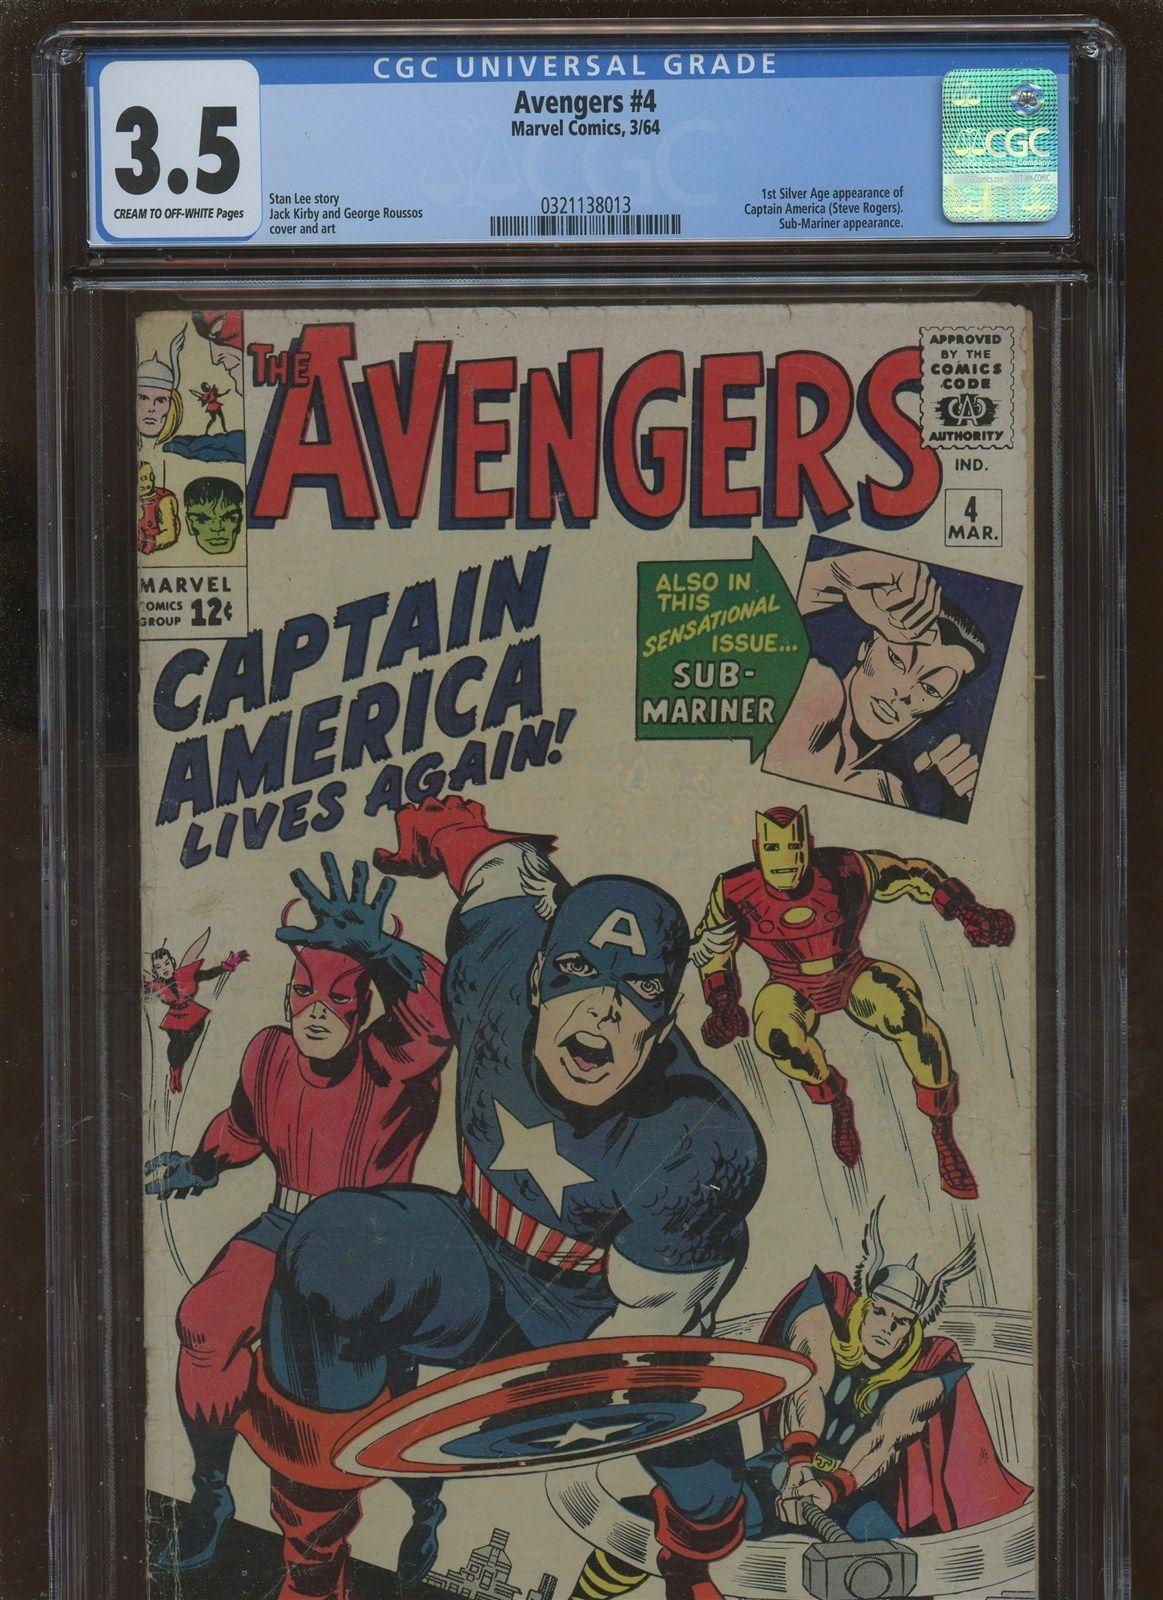 Avengers 4 CGC 3.5 VG * Marvel 1964 *   1st Silver Age Captain America